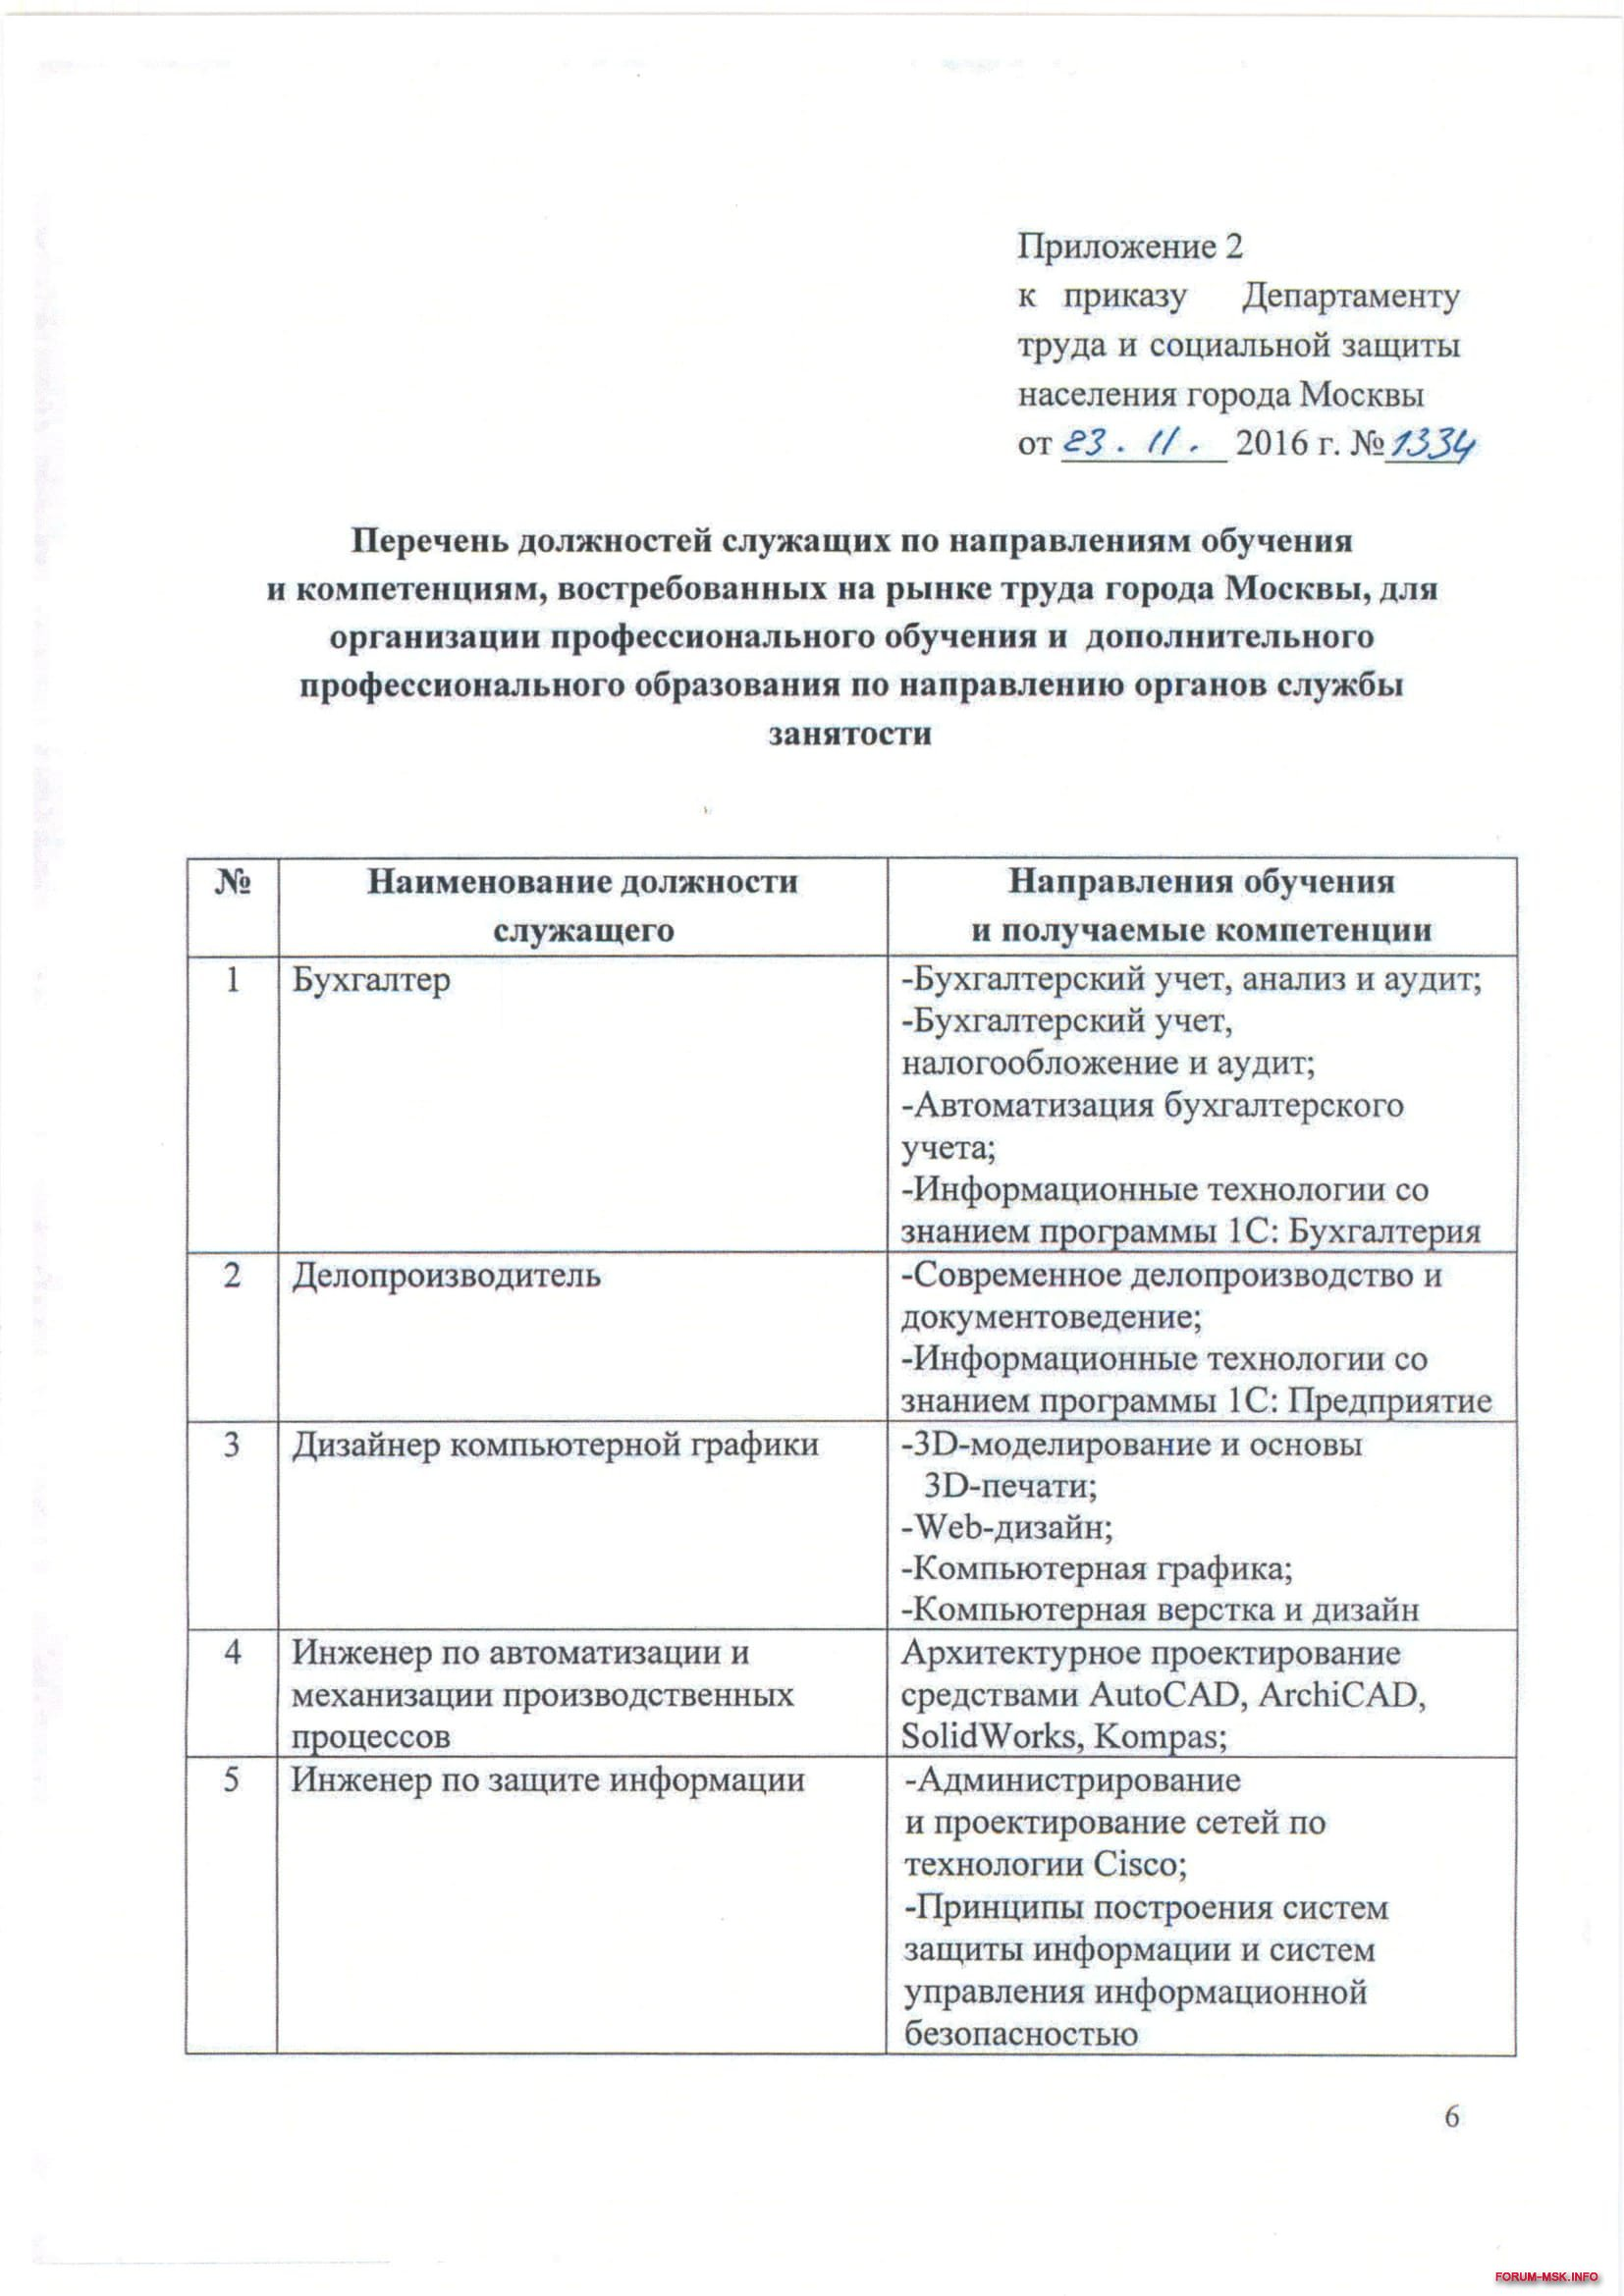 приказ дтсзн города москвы №1334-05.jpg